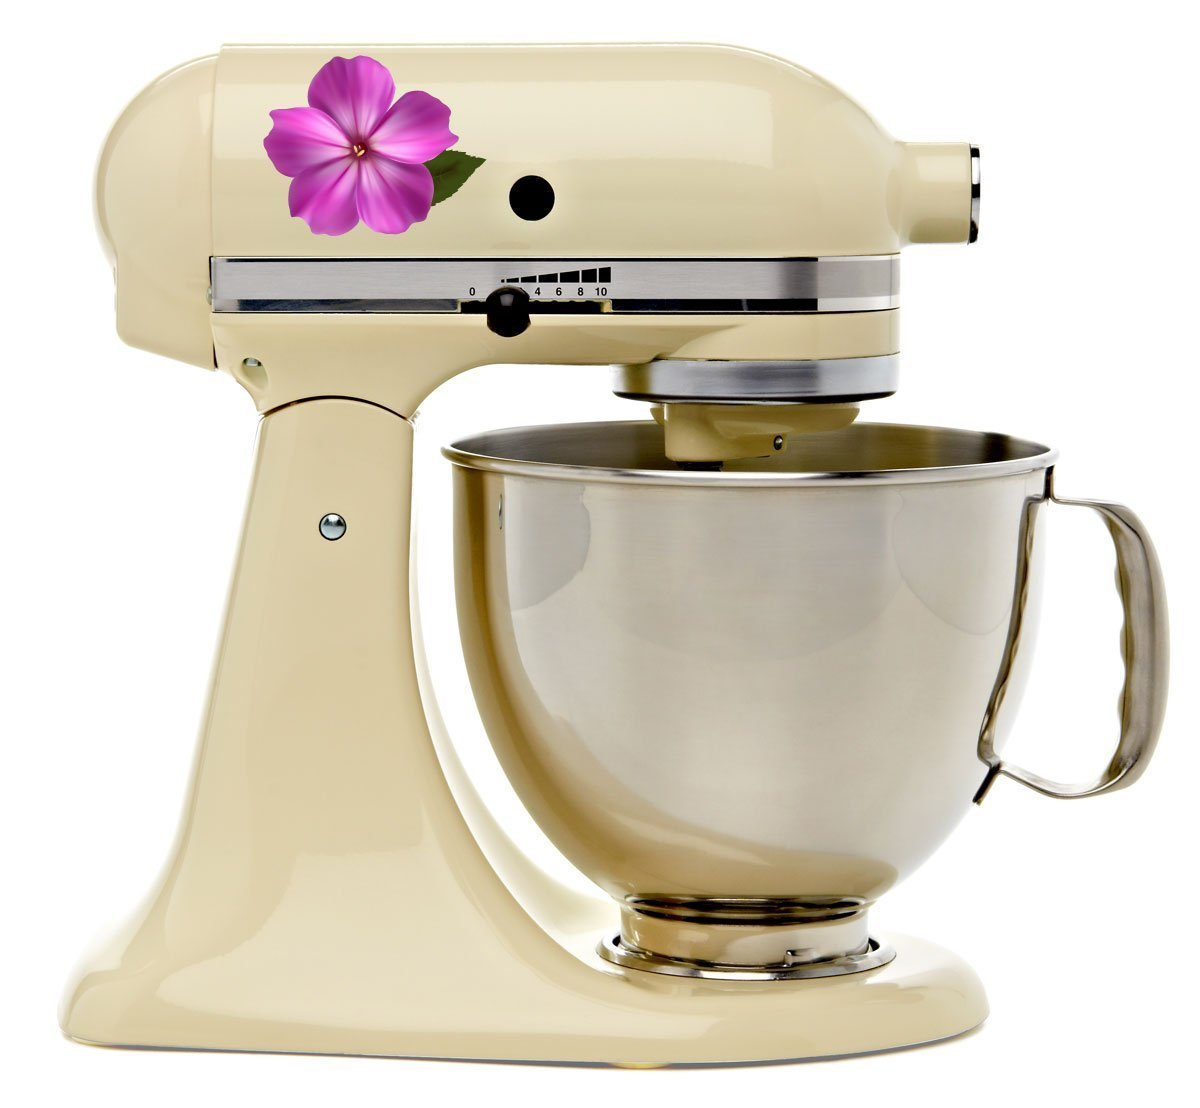 Amazon.com: Impatiens Flower Bakery Kitchenaid Mixer Mixing Machine Decal  Art Wrap: Kitchen U0026 Dining